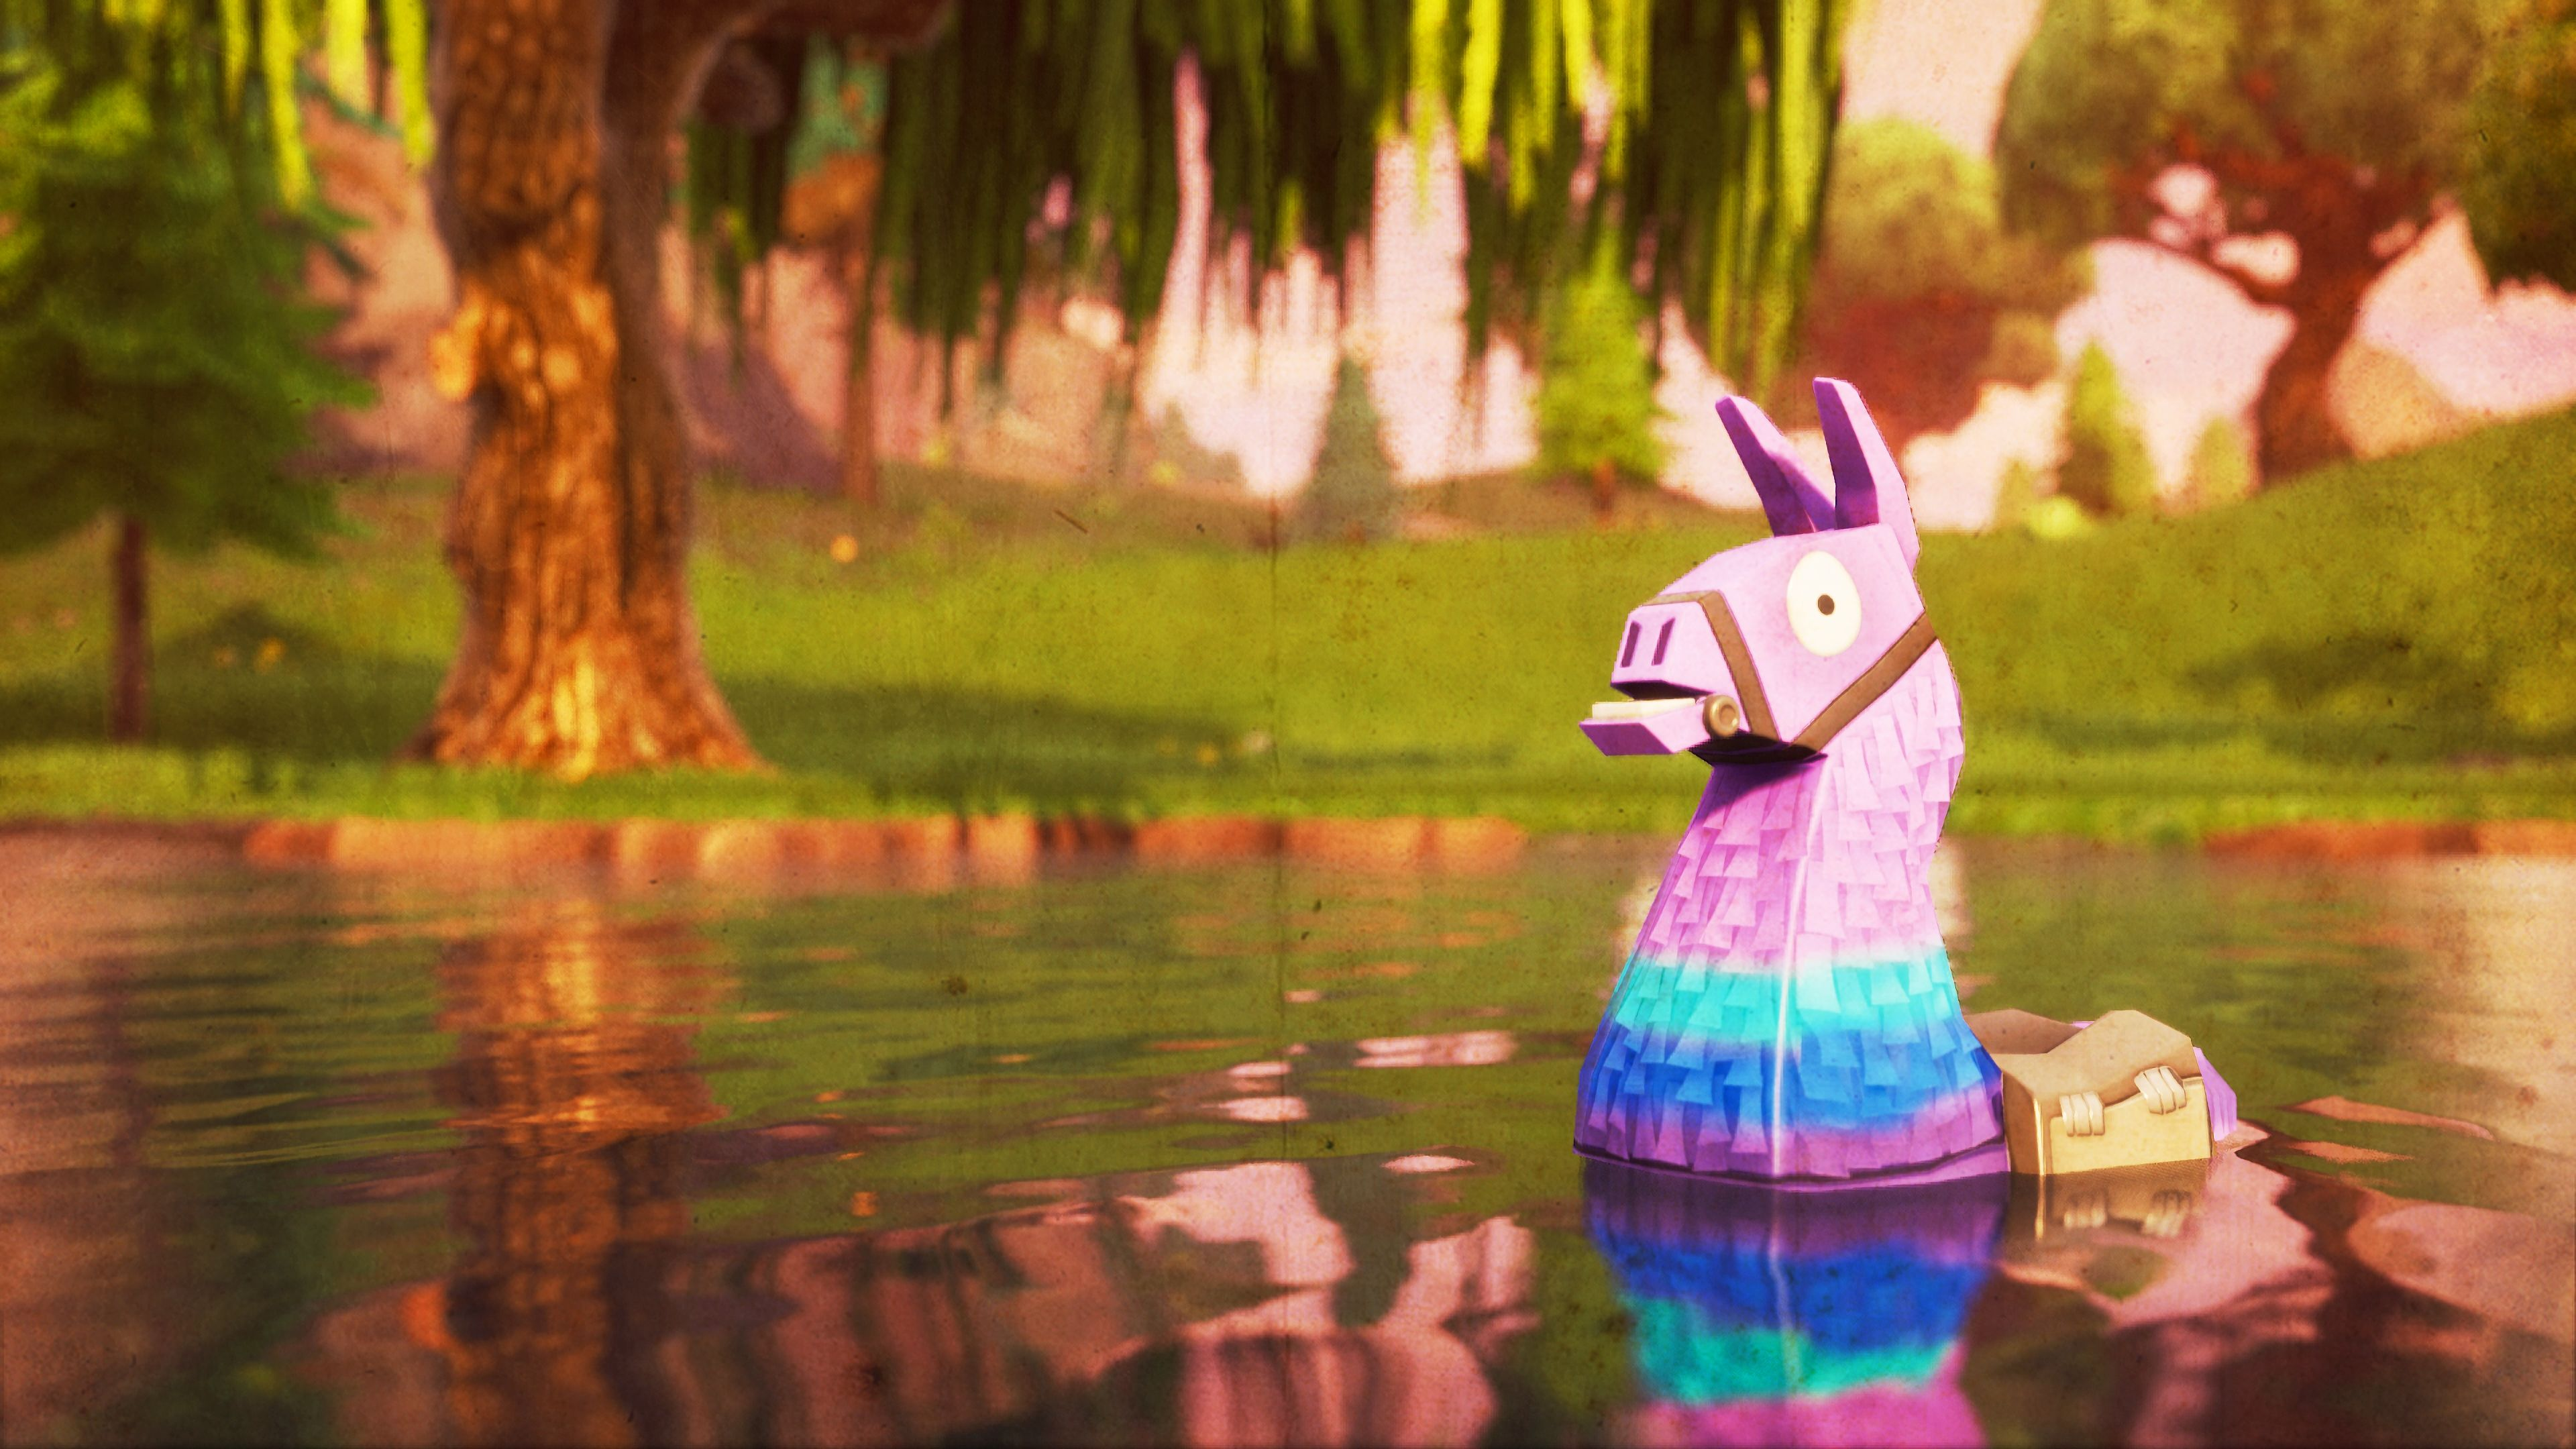 llama, Fortnite Battle Royale, Video Game, 3840x2160